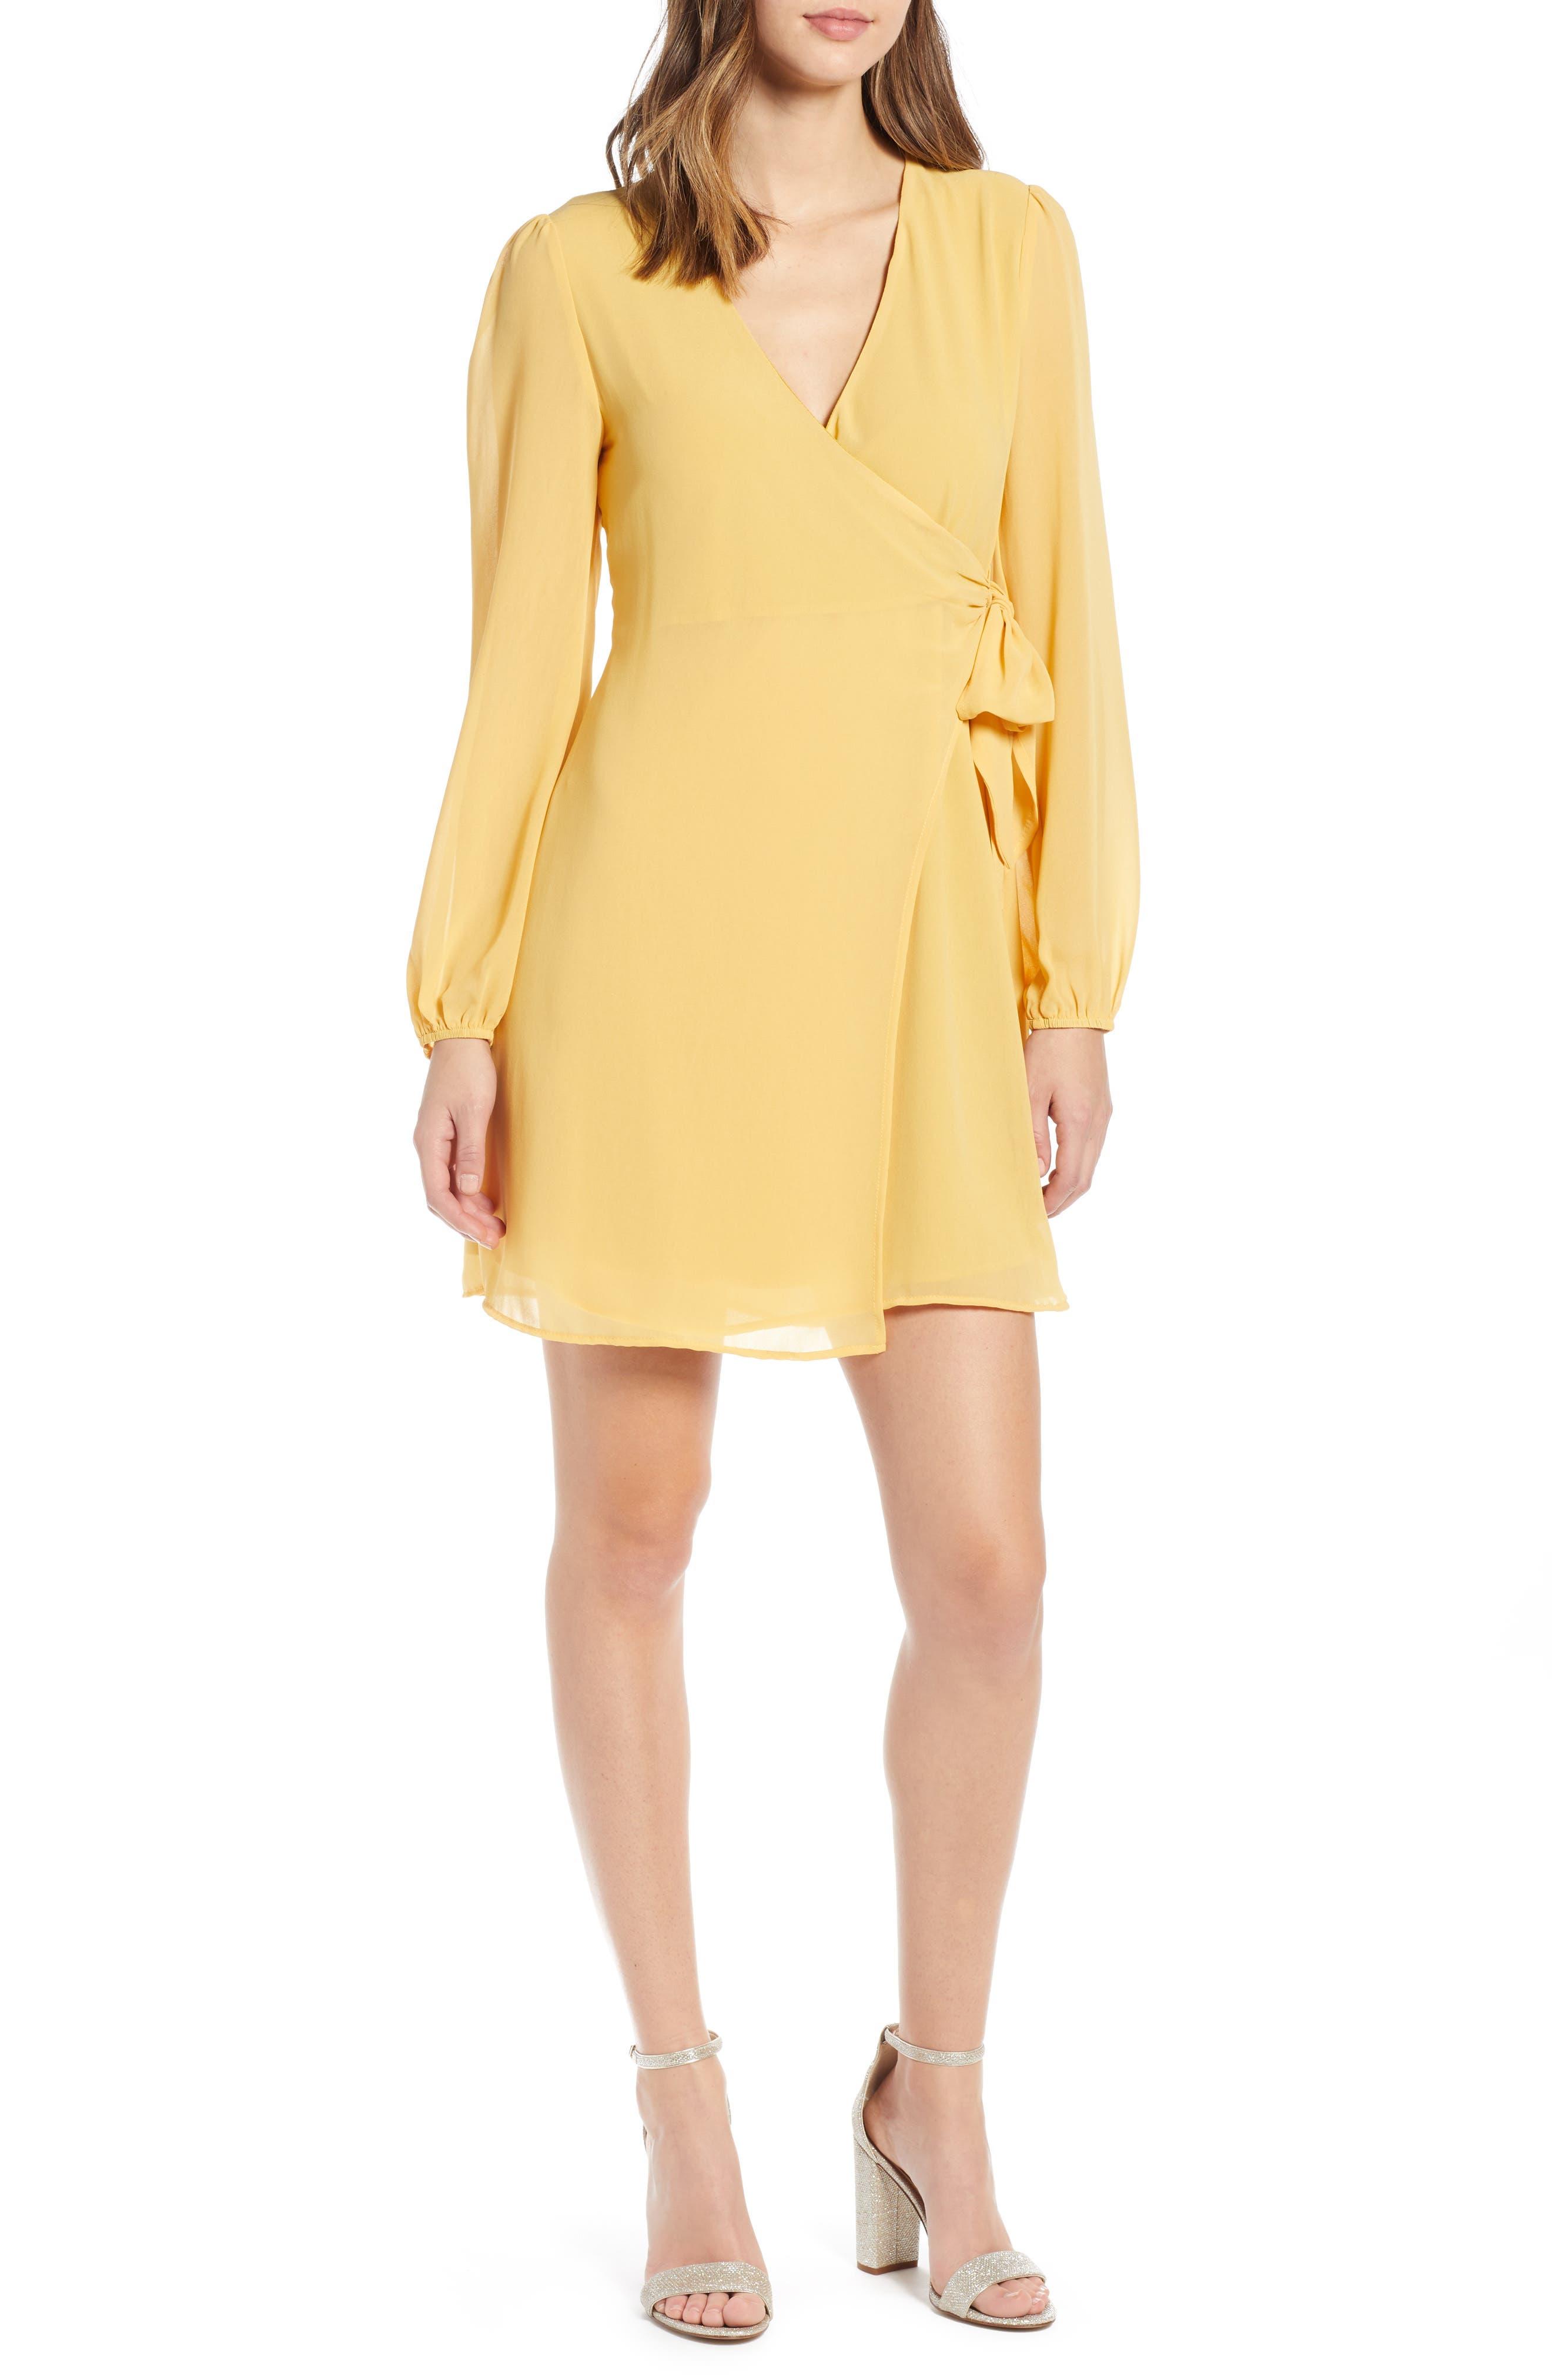 ROW A, Faux Wrap Dress, Main thumbnail 1, color, MUSTARD SOLID